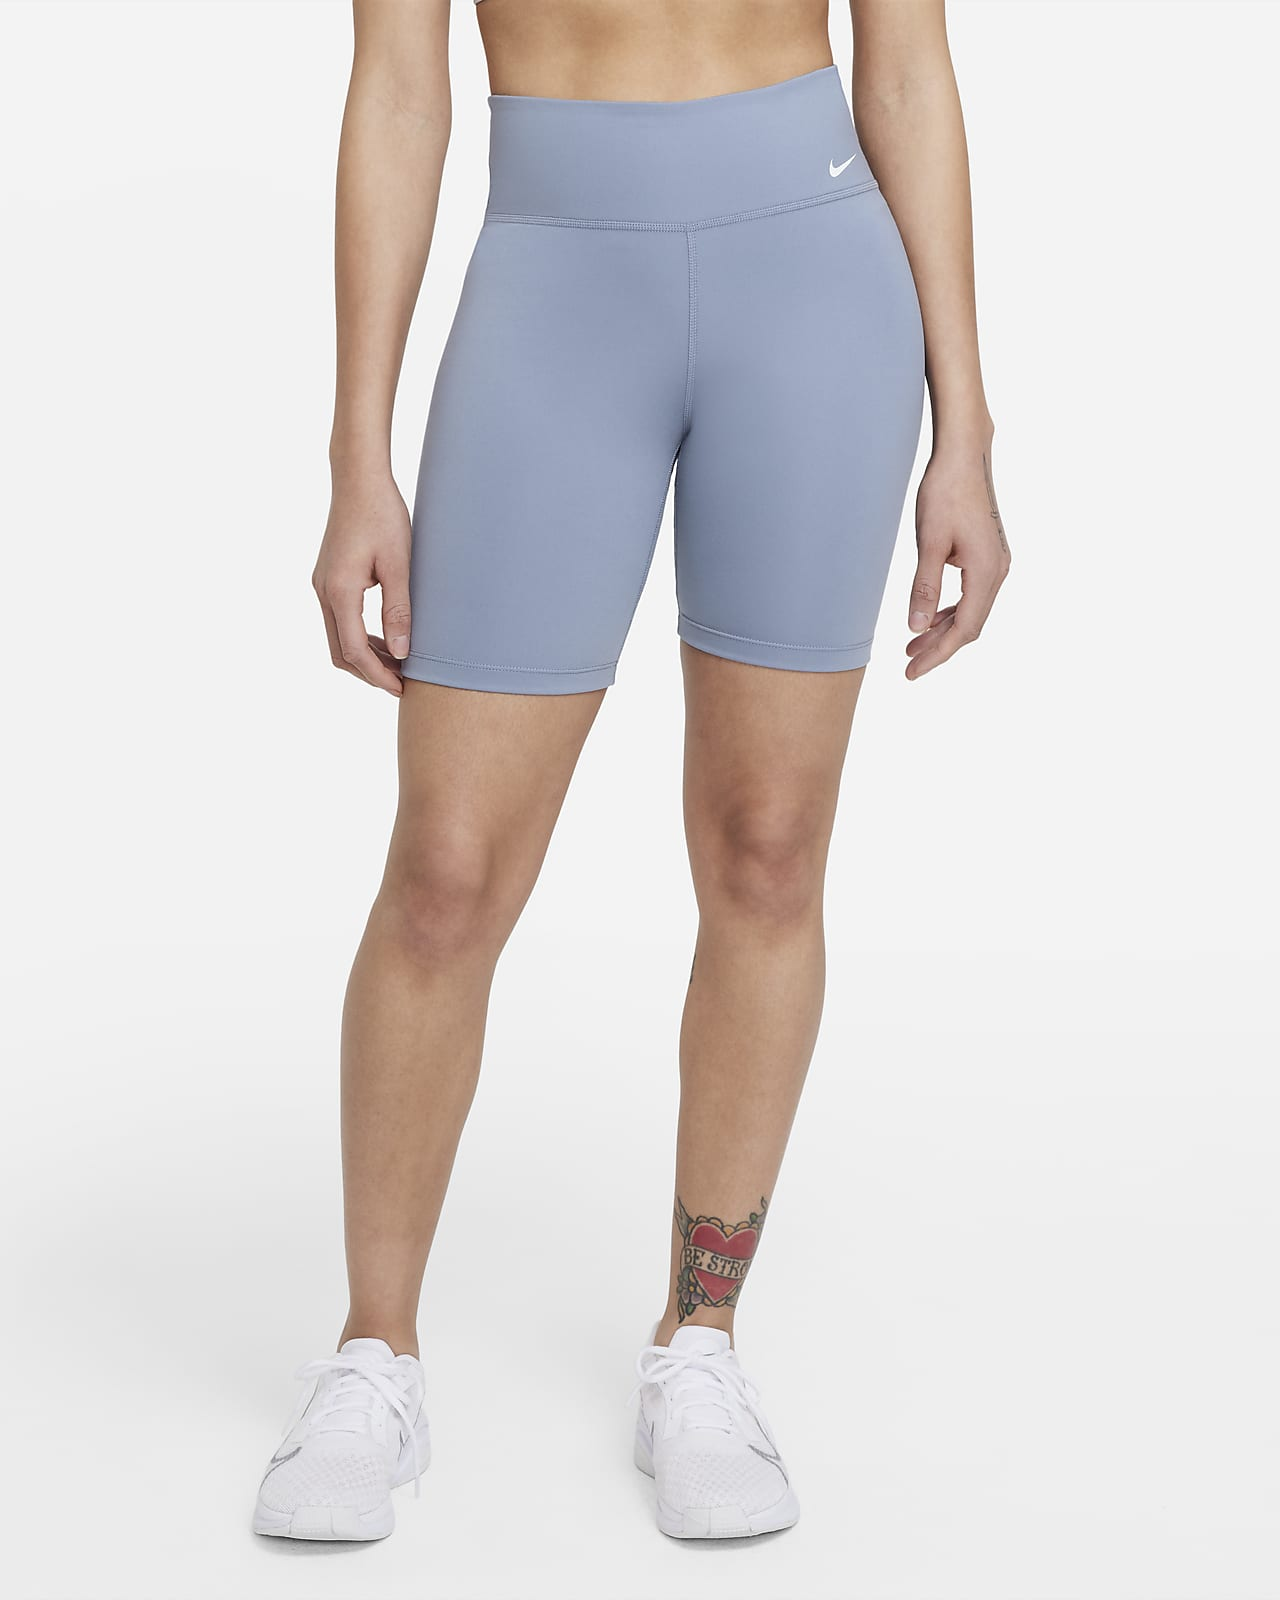 Shorts de ciclismo de 18 cm y tiro medio para mujer Nike One